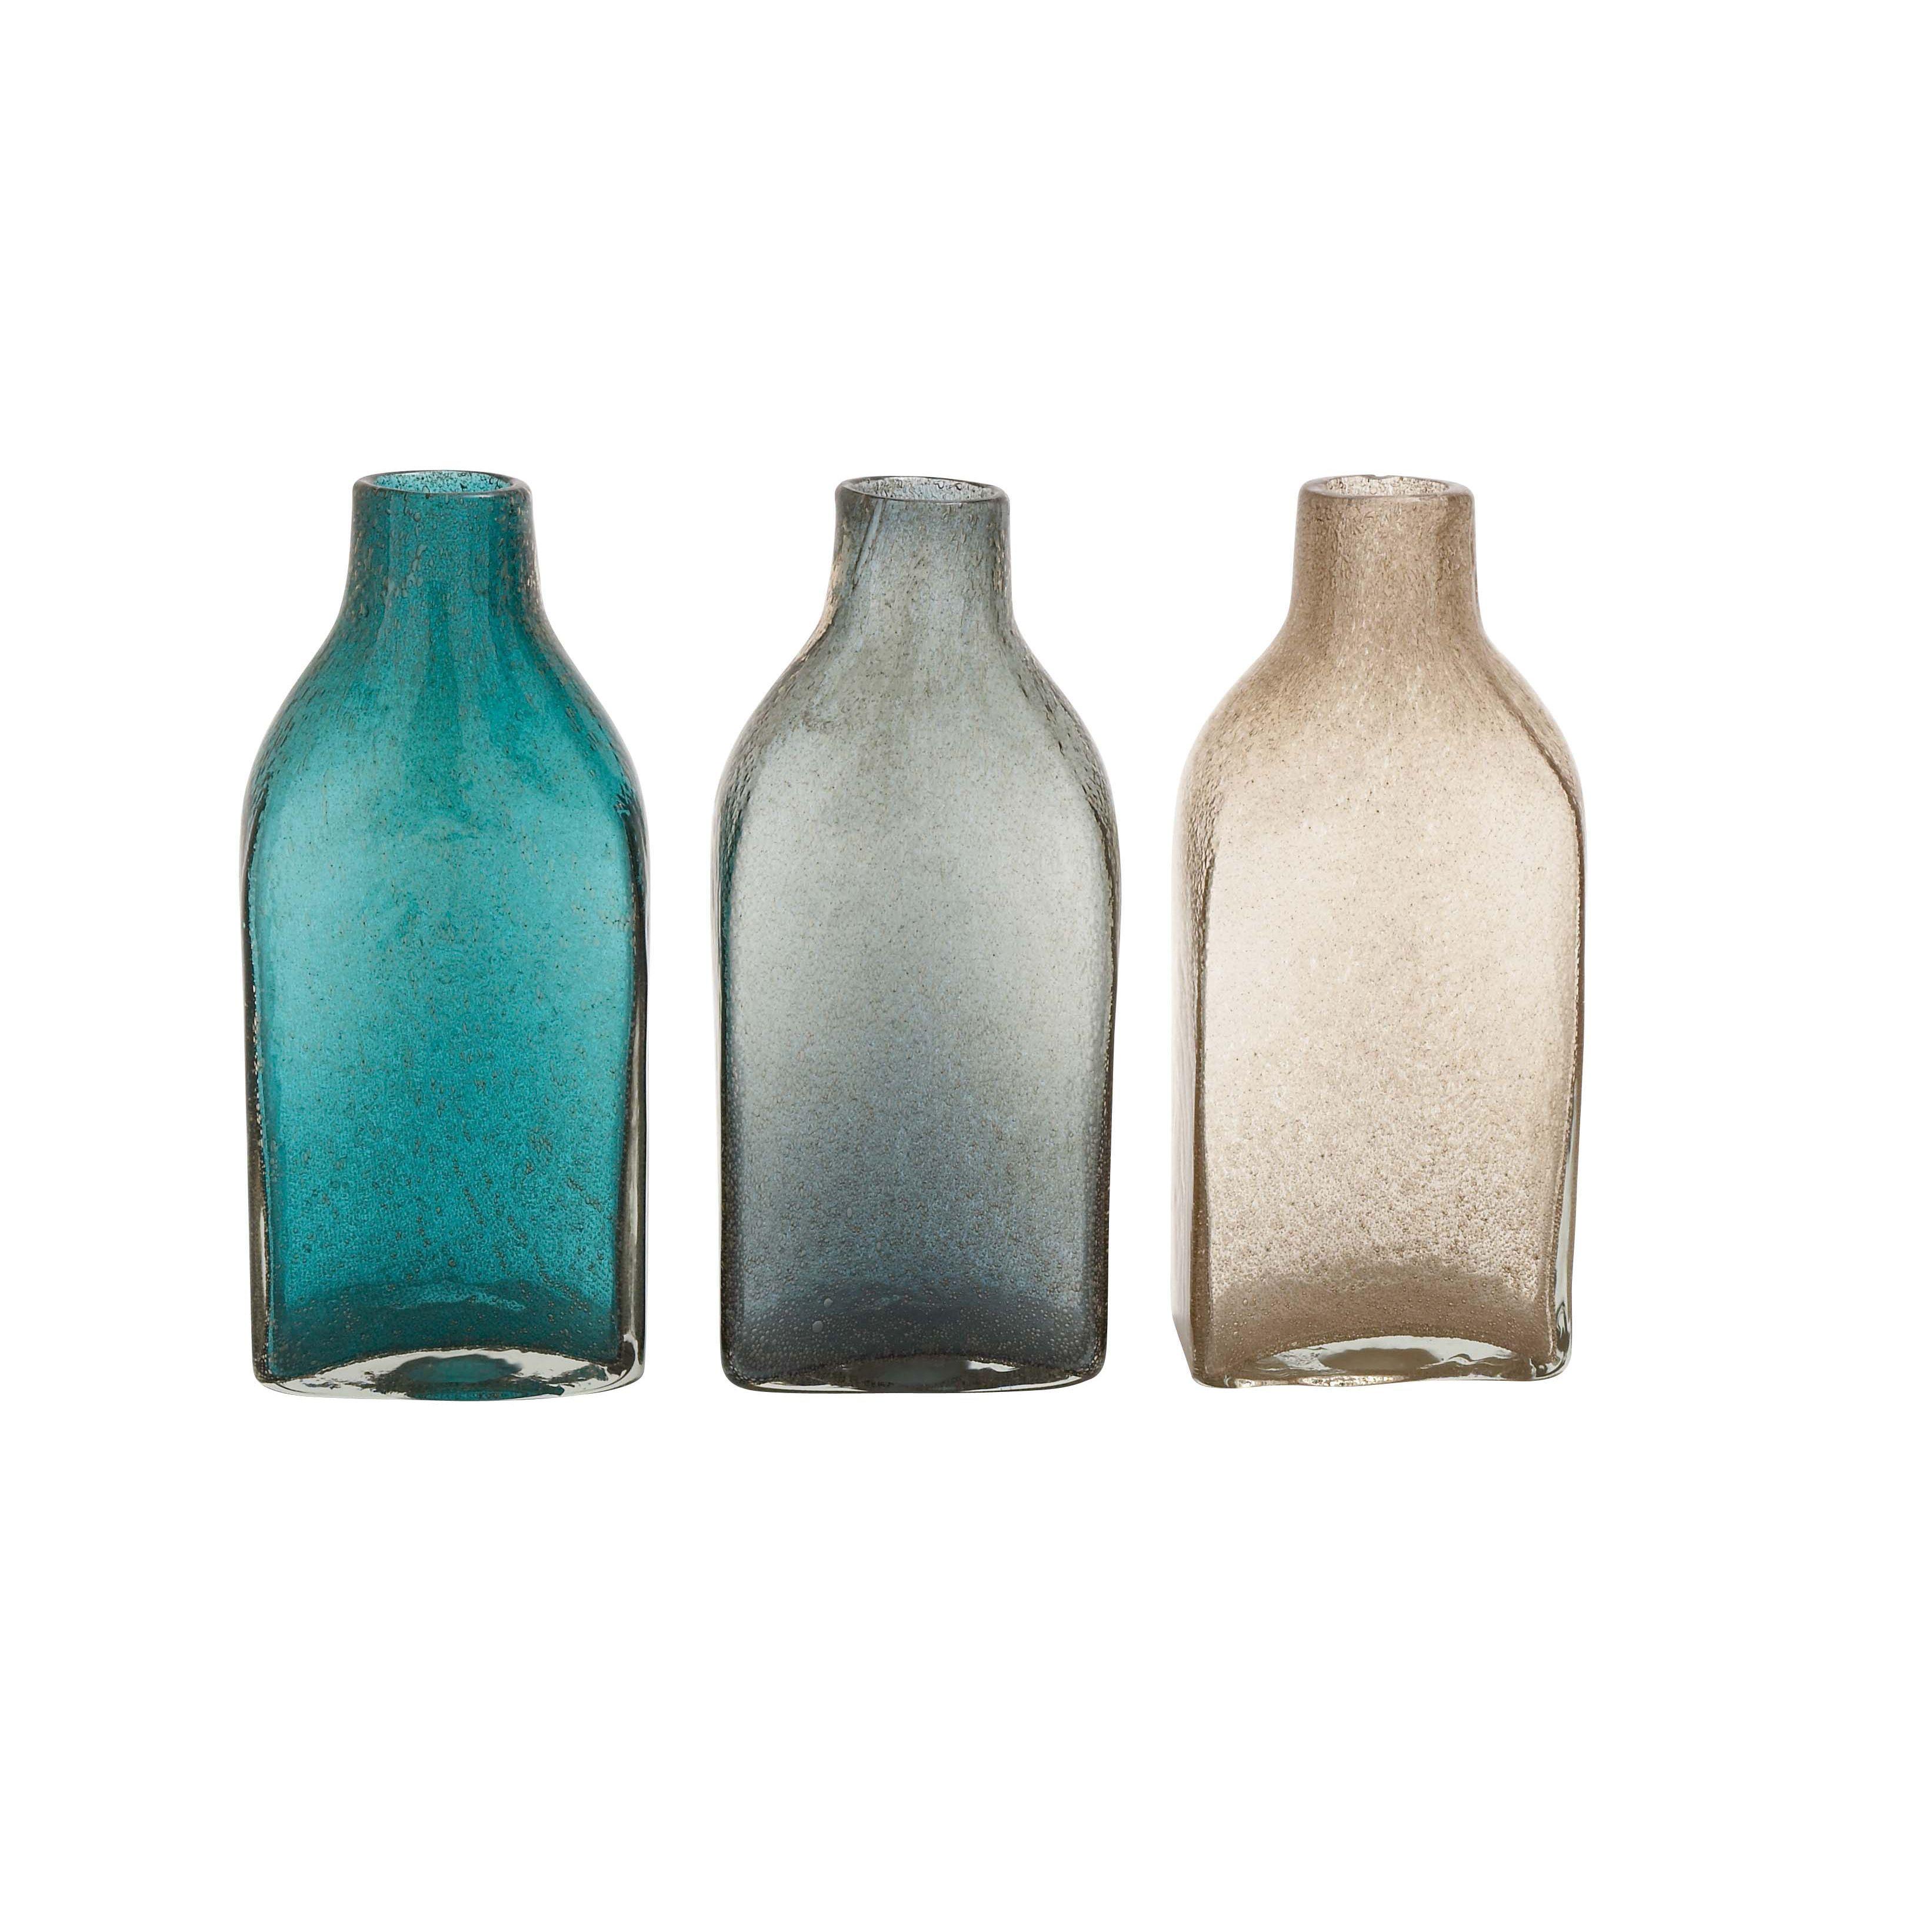 Glass Decorative Bottles Blue Grey And Brown Glass 3 Assorted Bottle Vases Vase Size